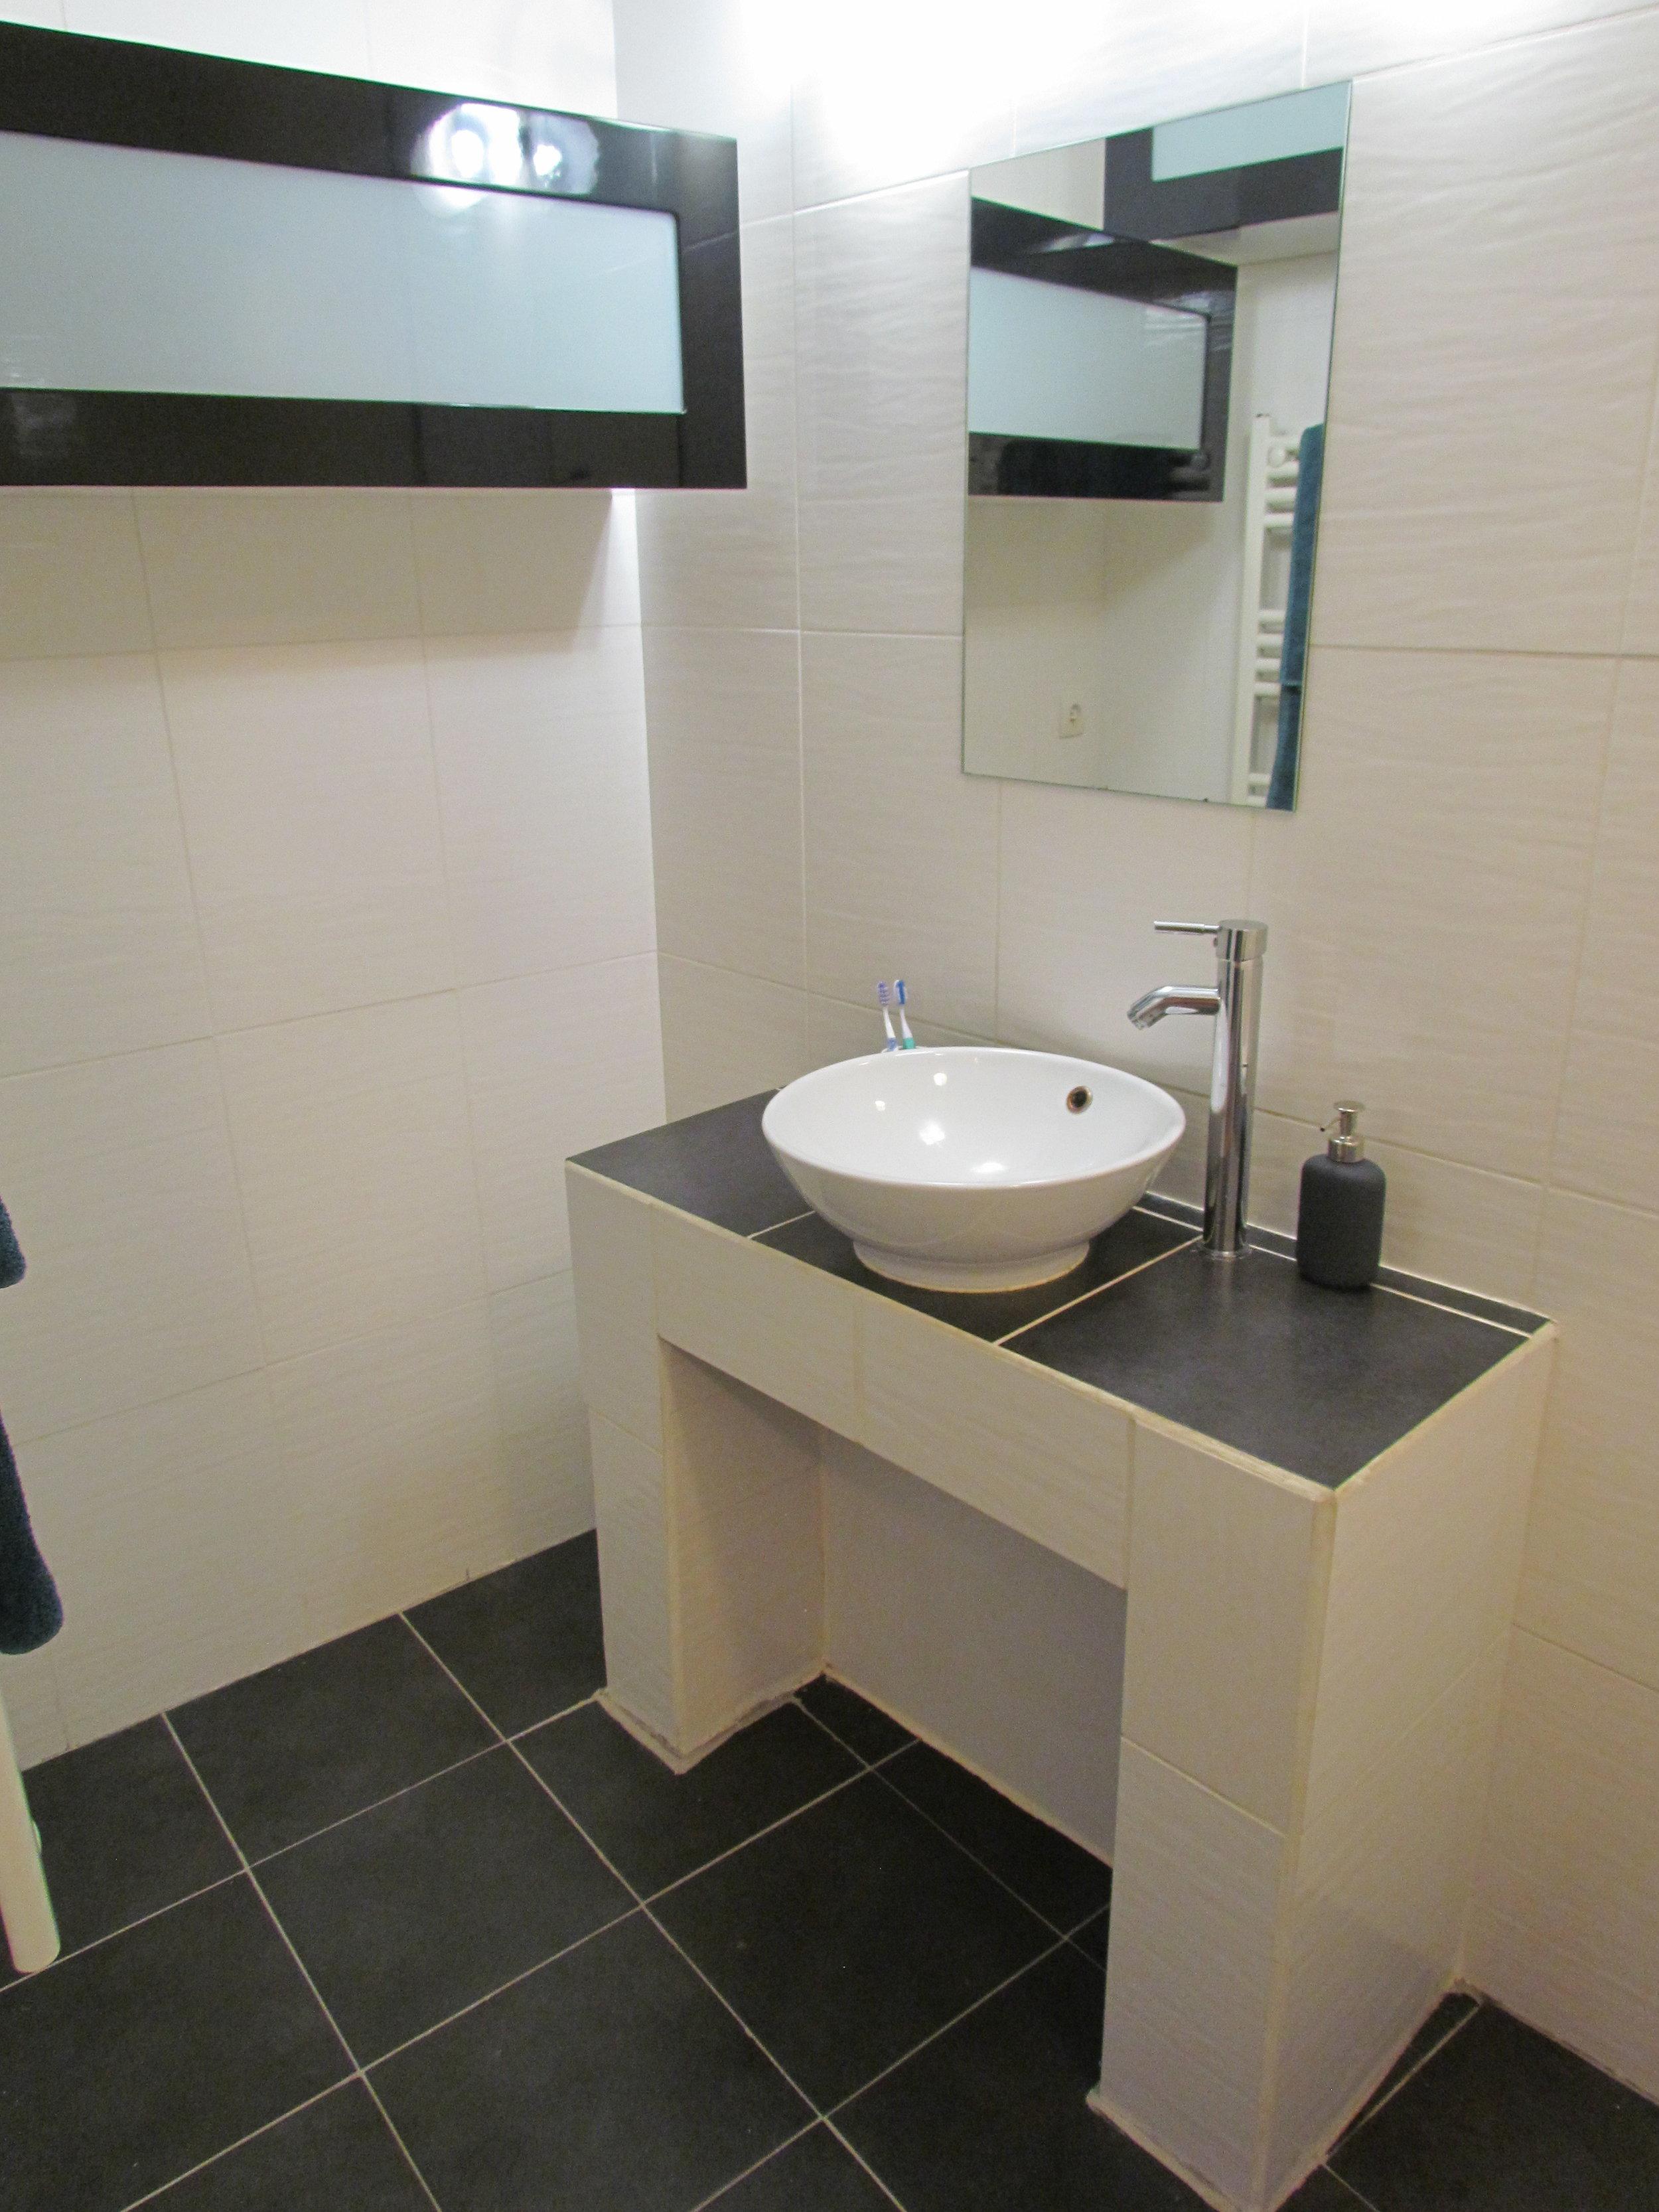 Bathroom - sink and one cupboard.JPG